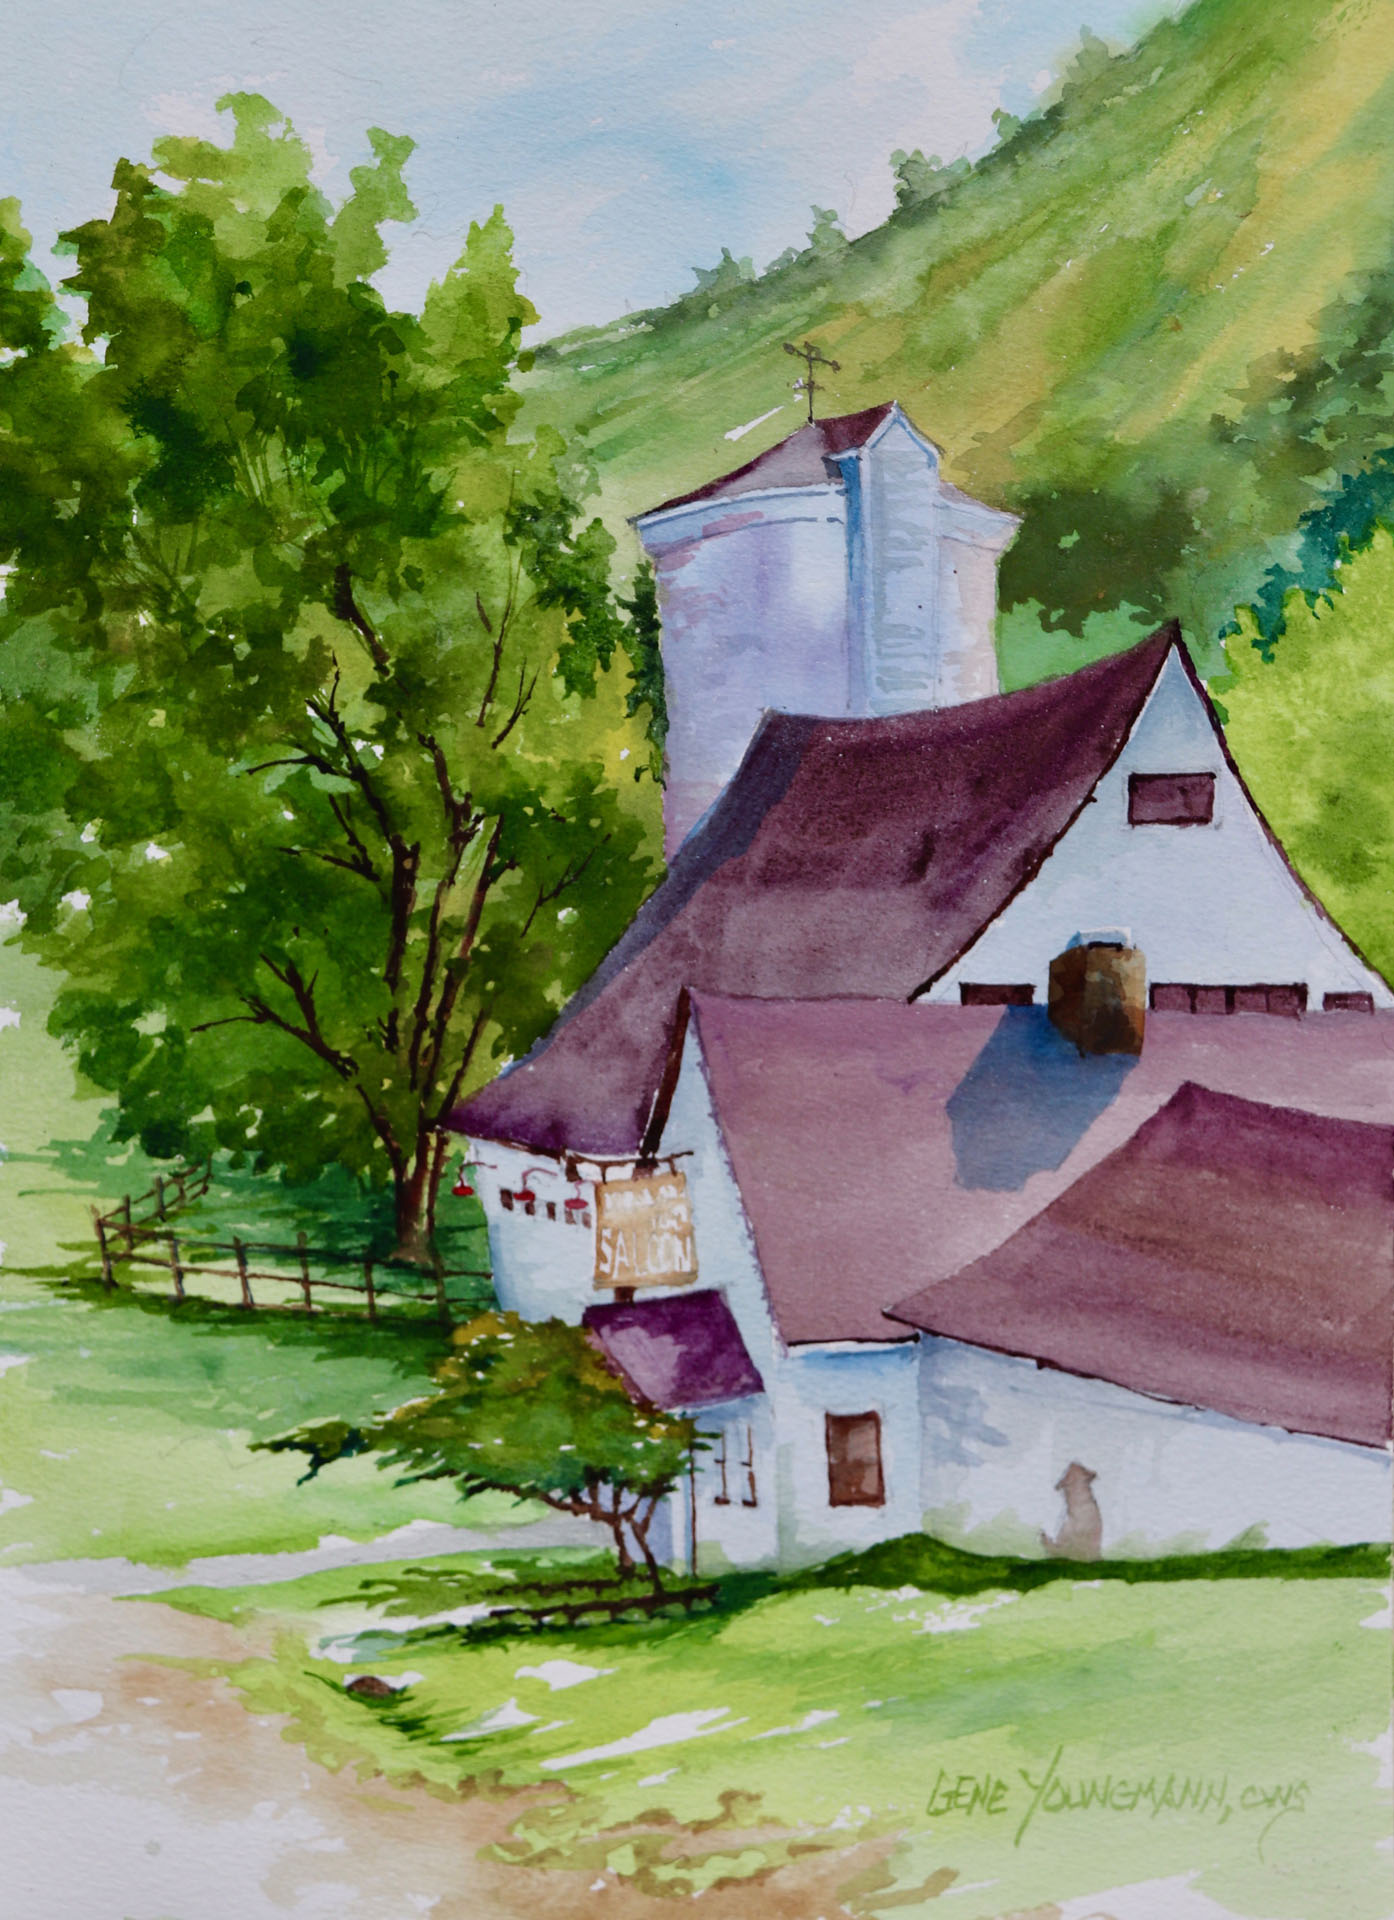 Silo, Barns & Saloon